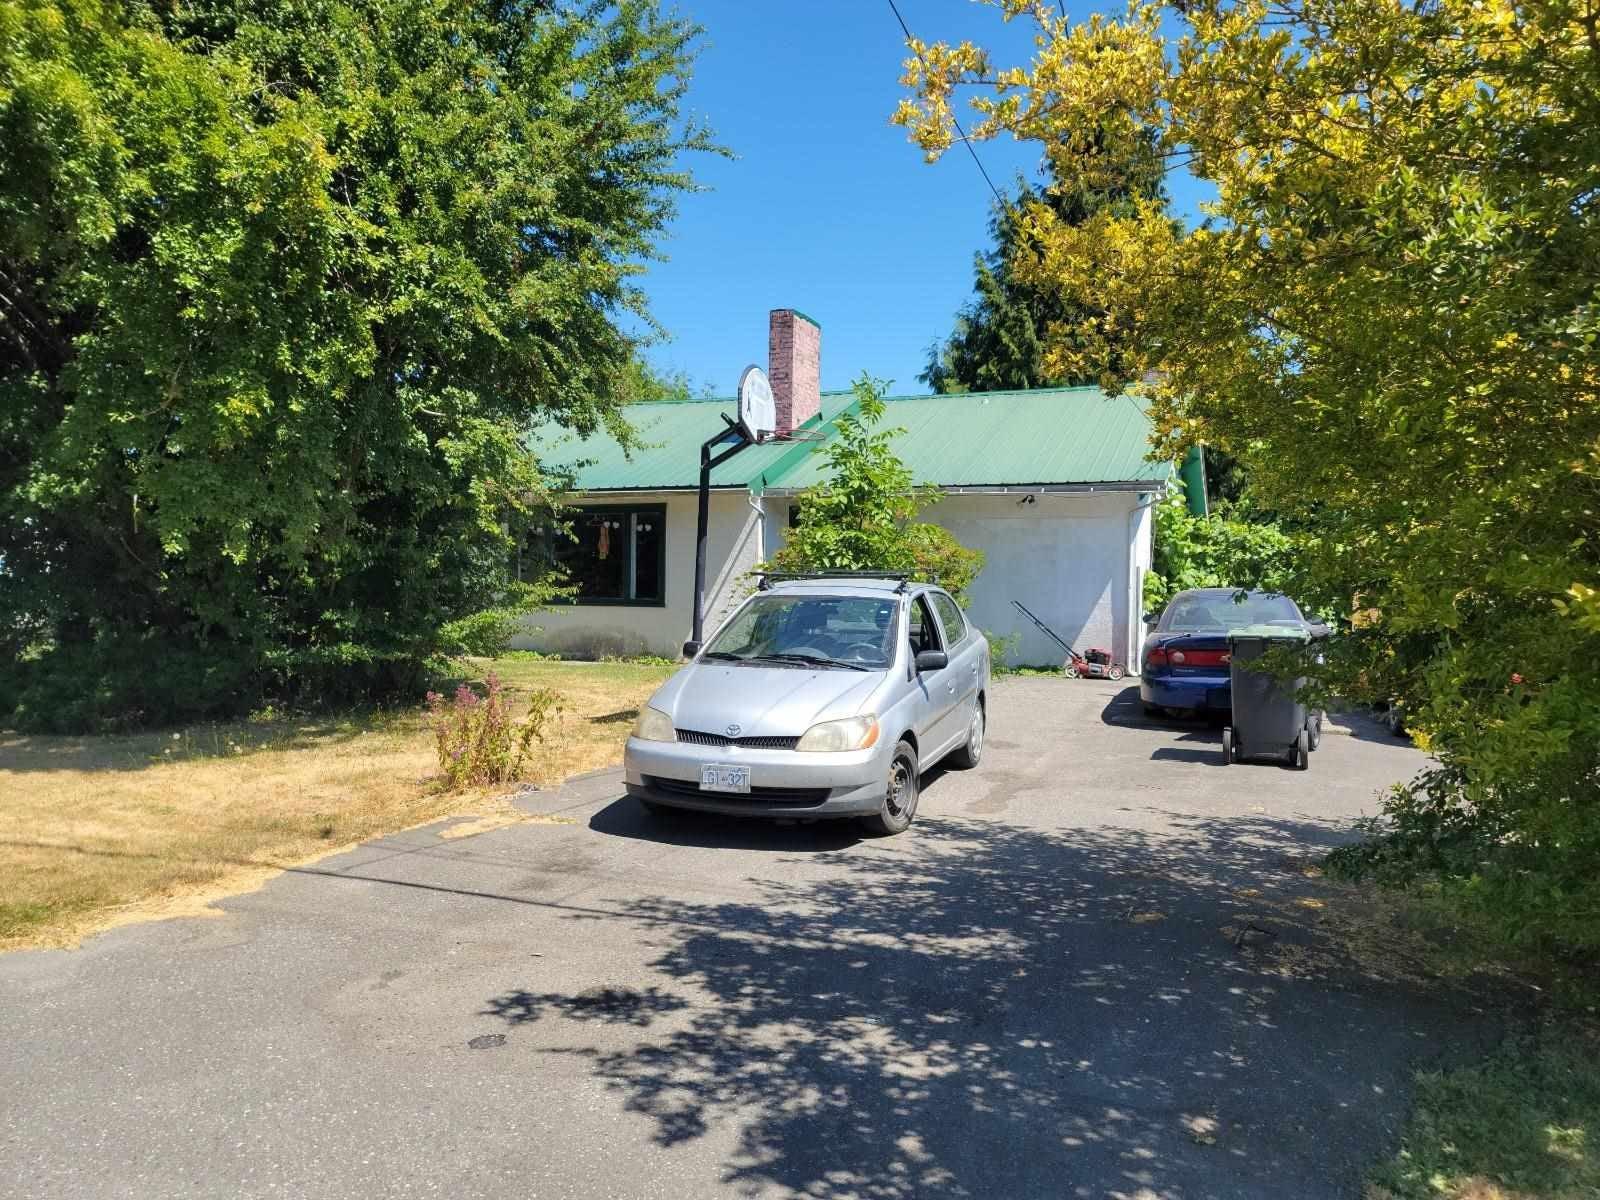 2972 271 STREET - Aldergrove Langley House/Single Family for sale, 3 Bedrooms (R2605802) #1